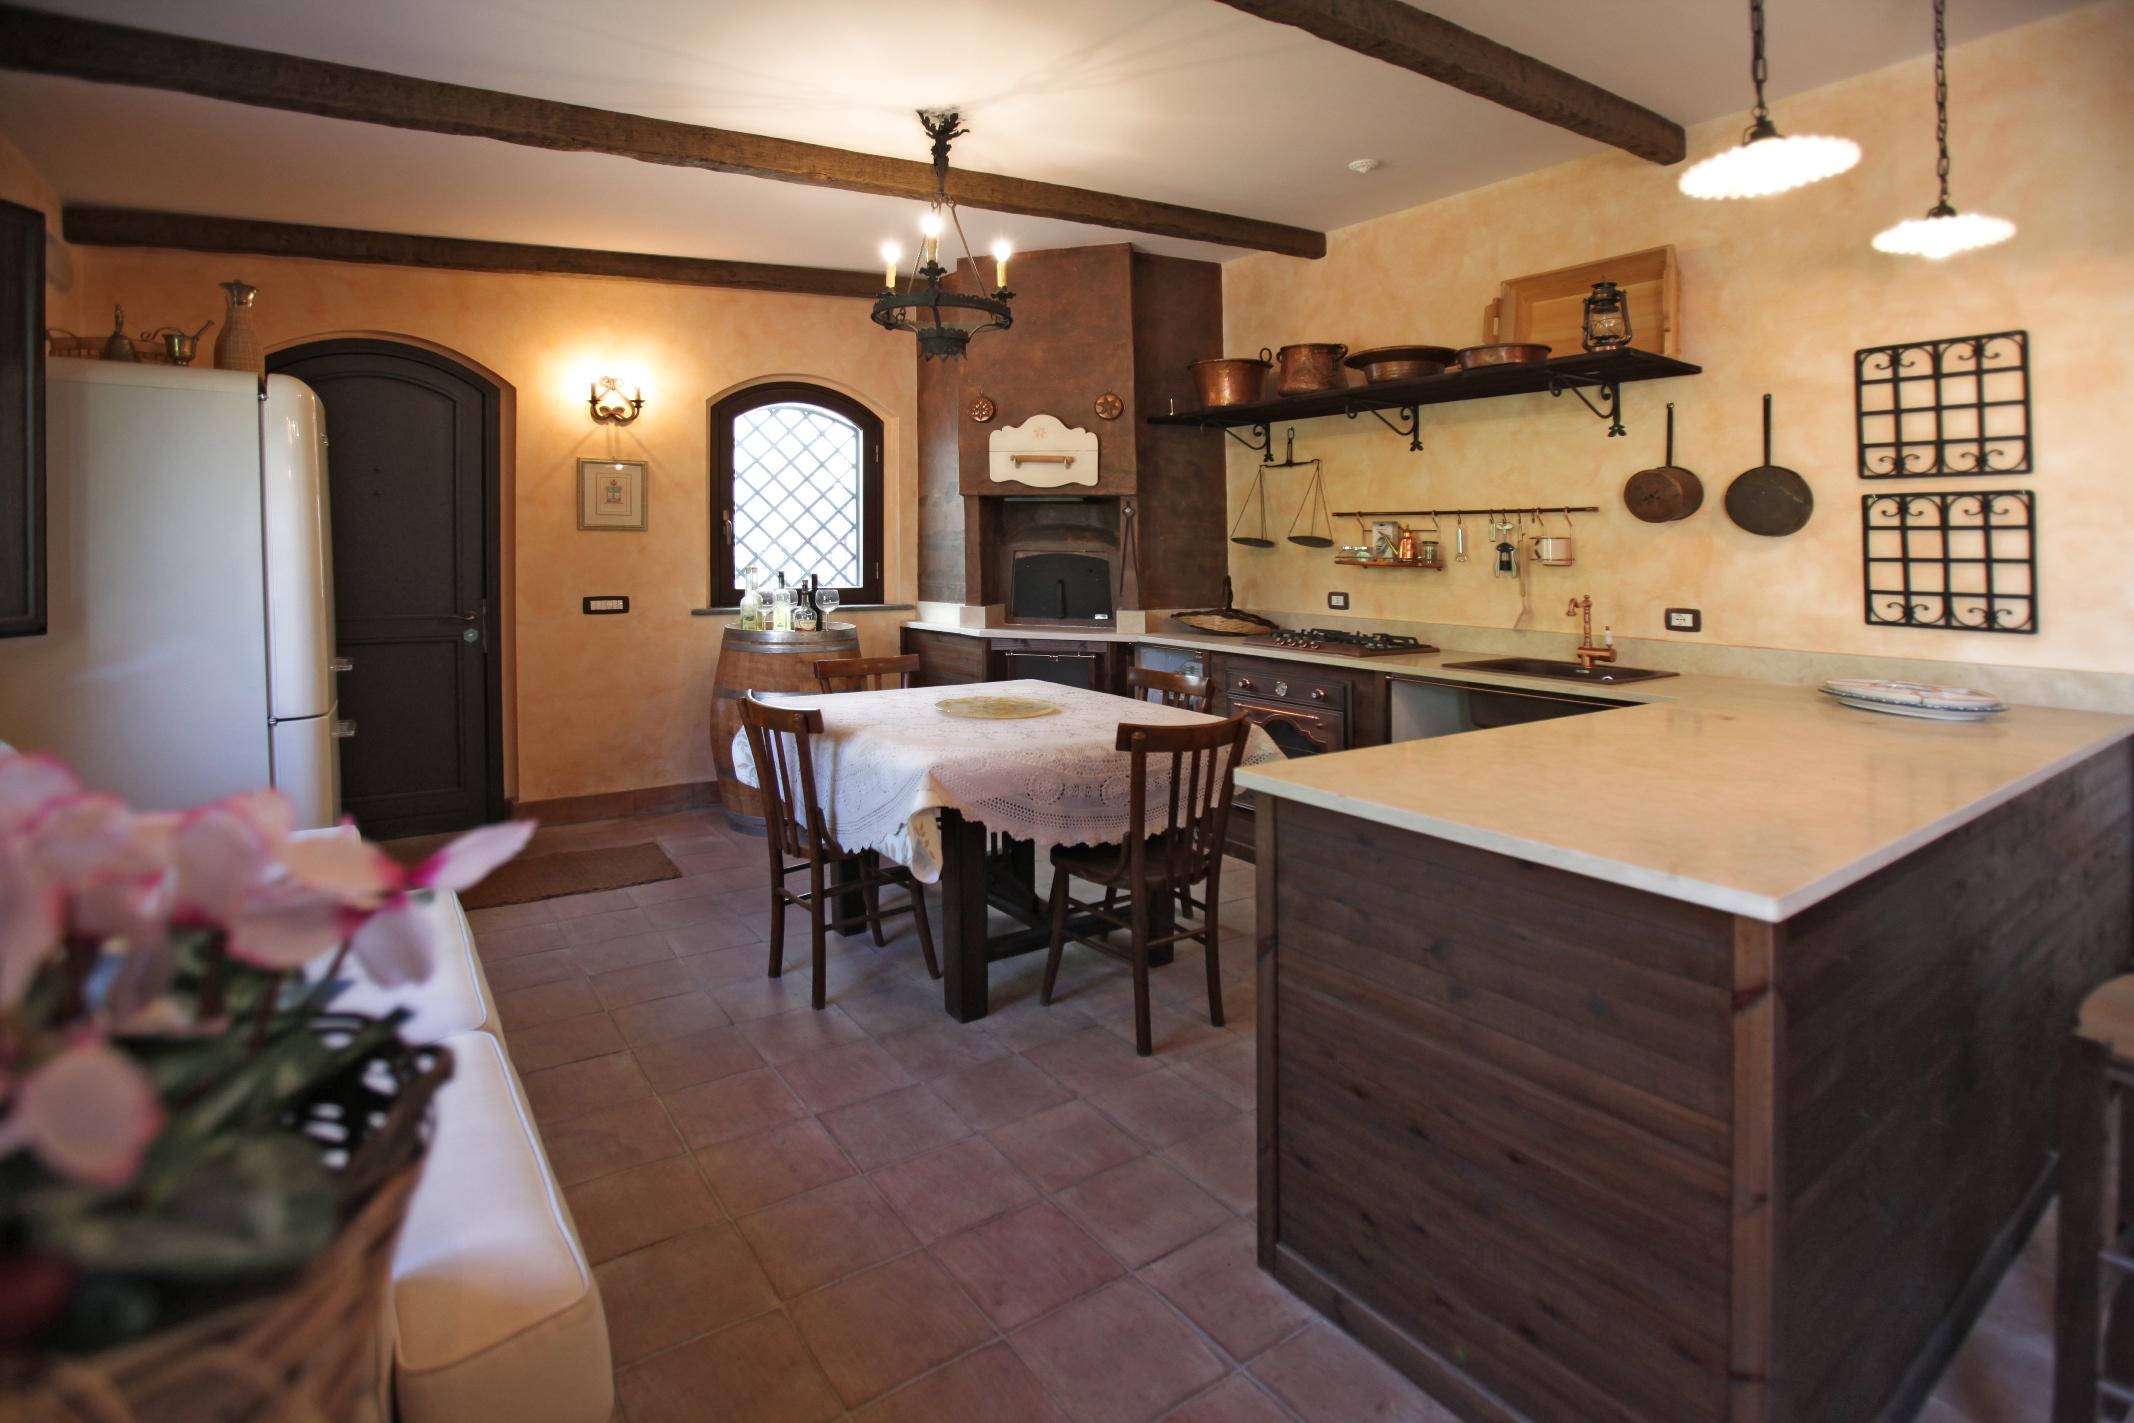 Maison de vacances A Casa di Ludo mit parkplatz (2124257), Catania, Catania, Sicile, Italie, image 4